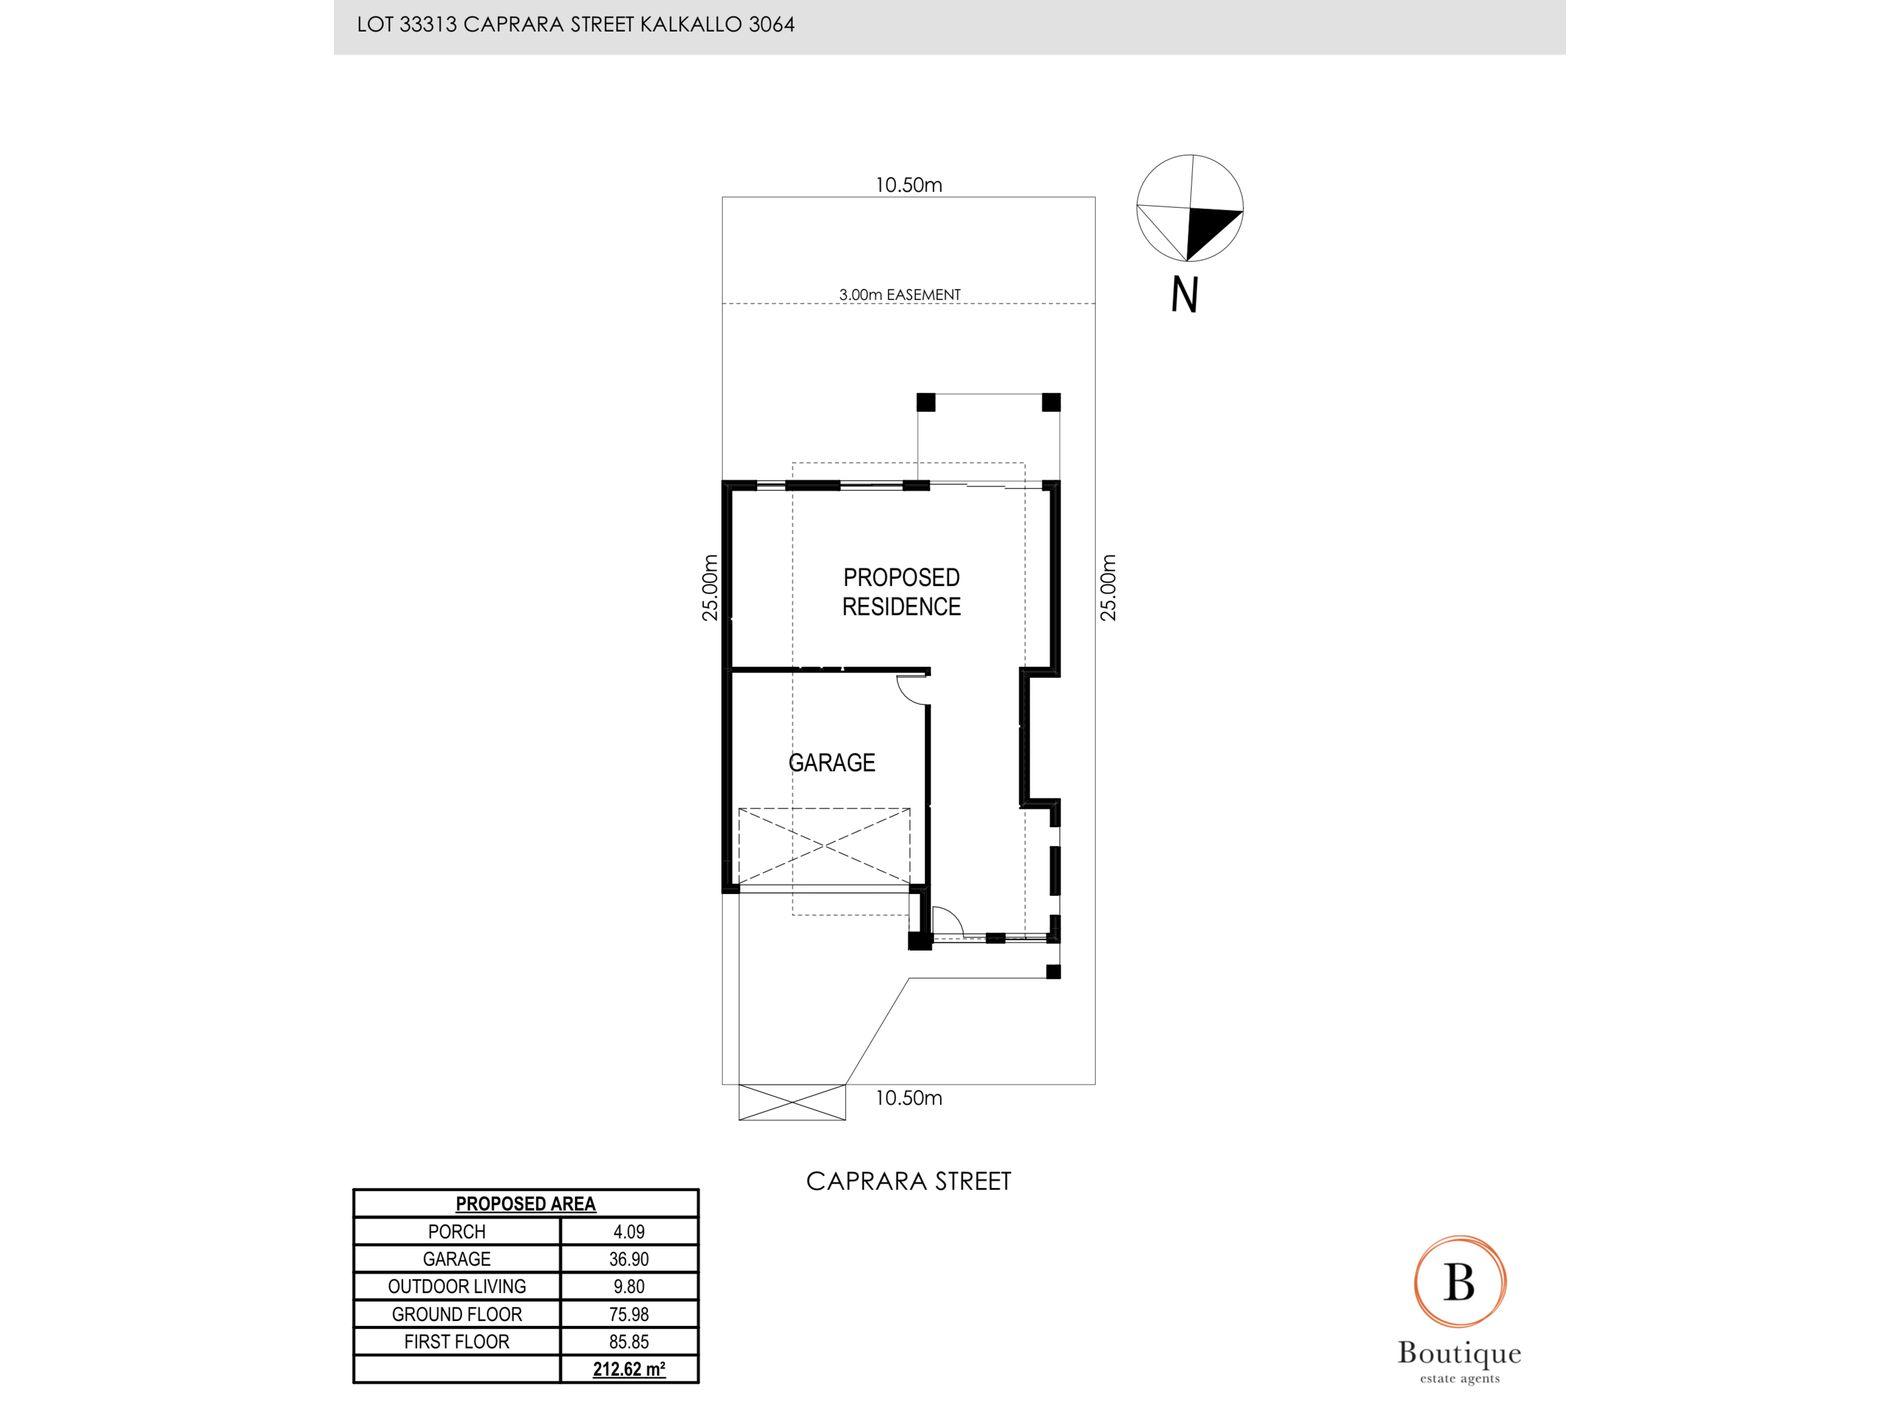 Lot 33313 Captara Street, Kalkallo